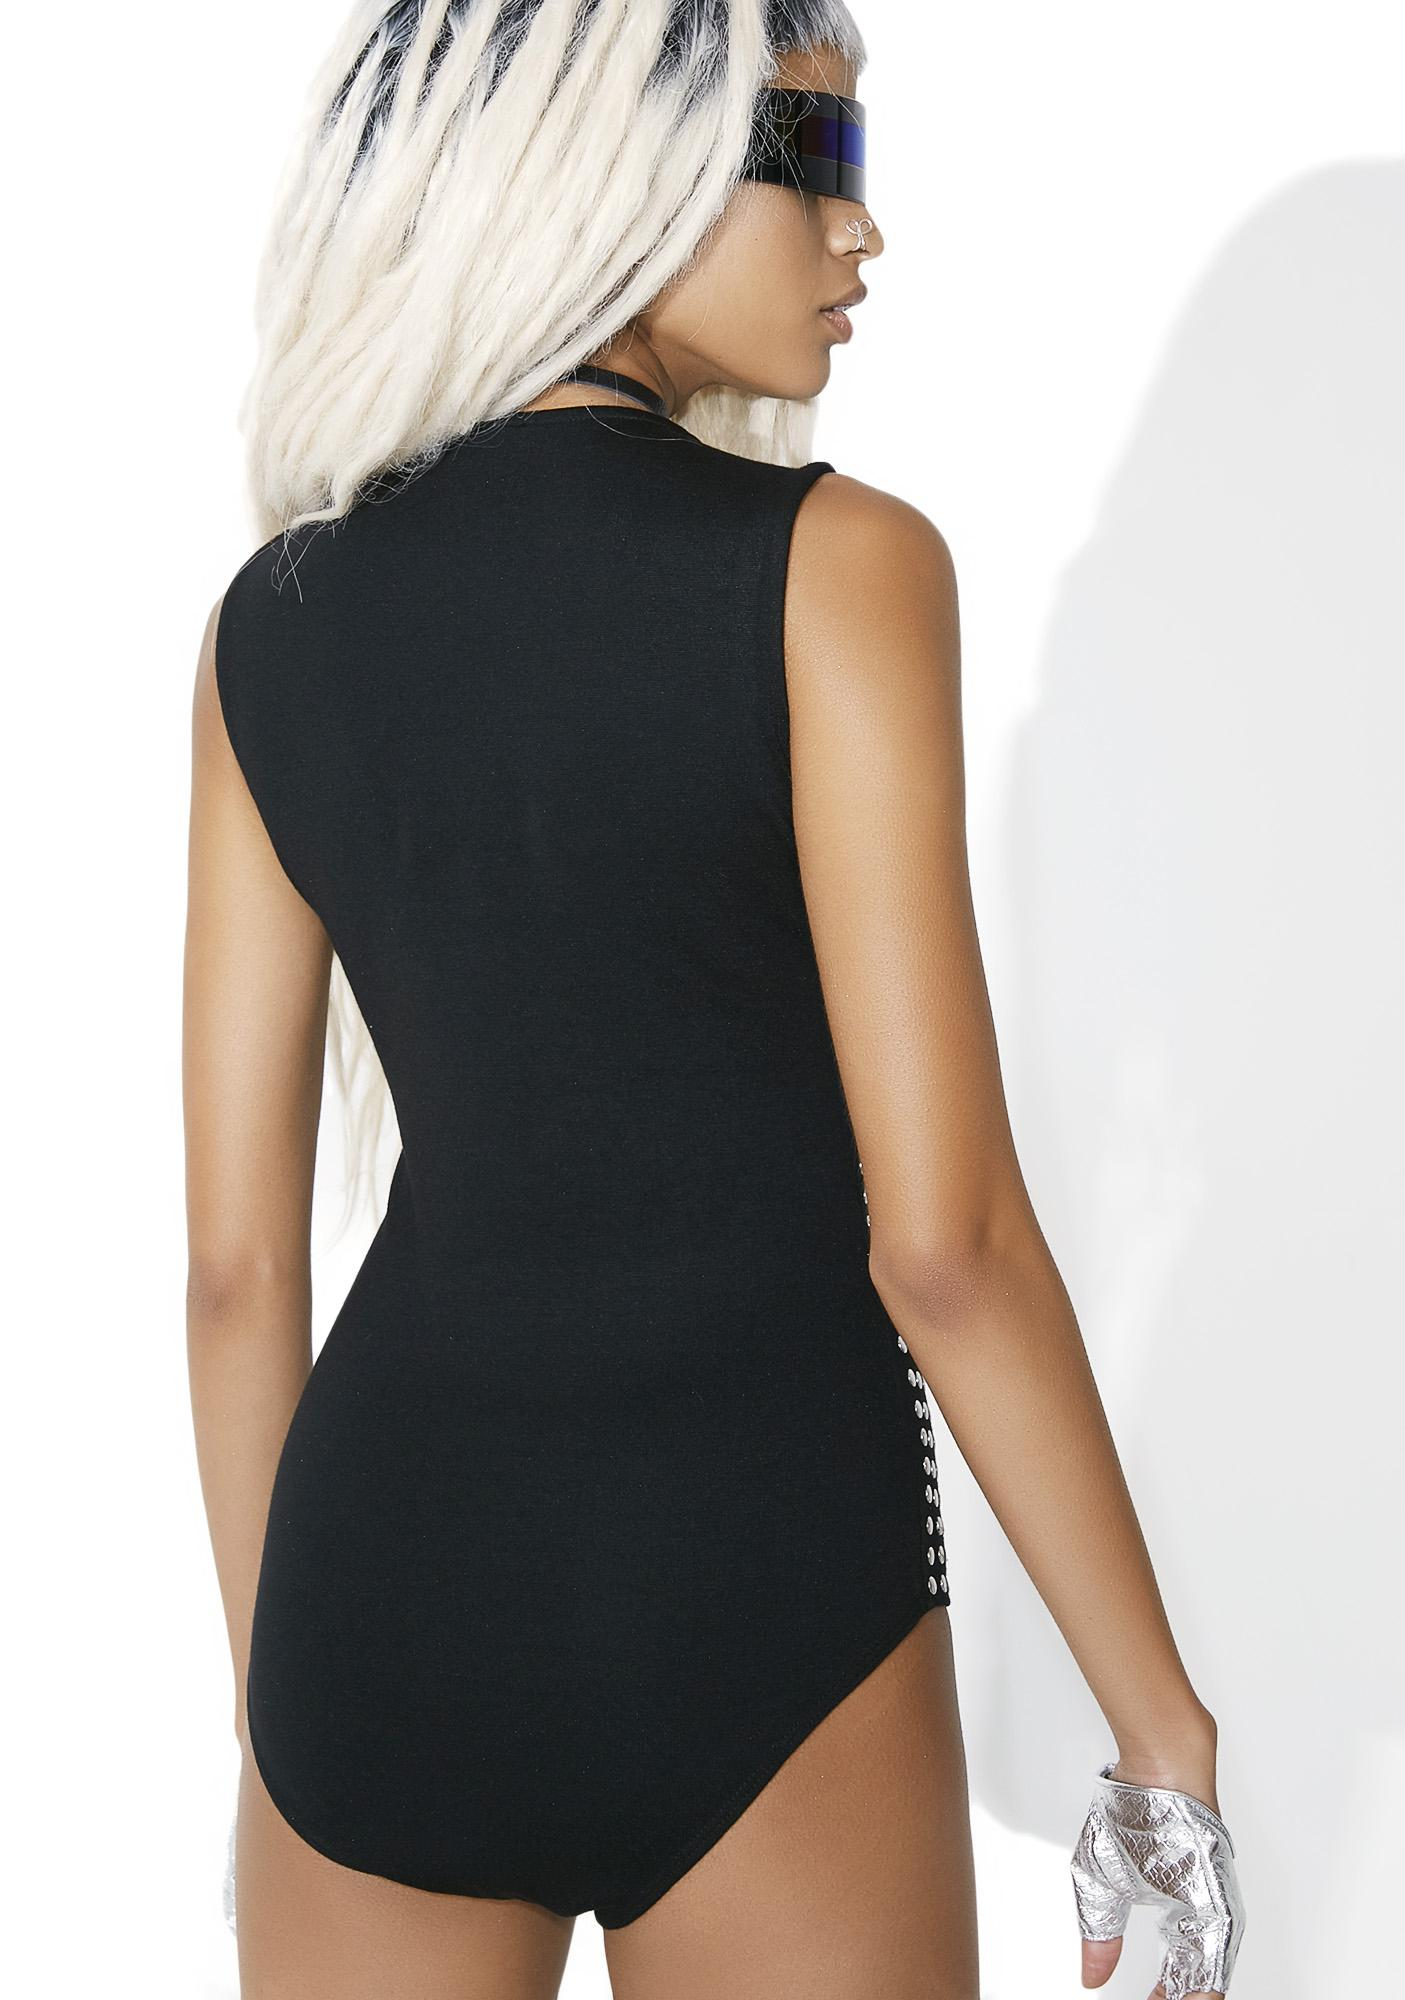 Furiosa Studded Bodysuit